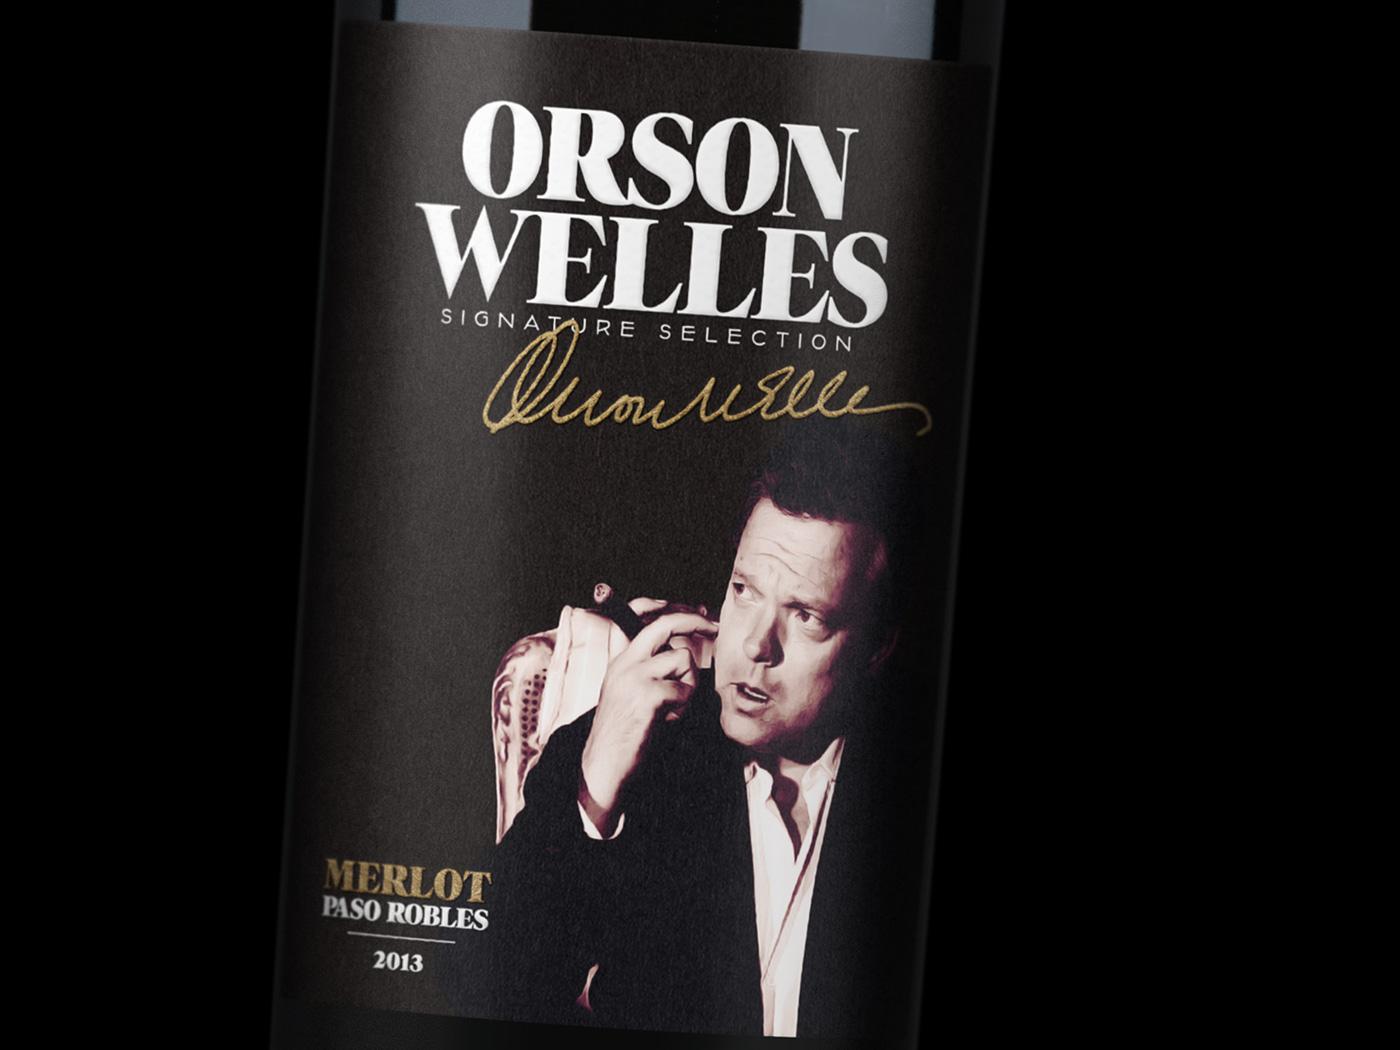 Orson Welles Signature Selection Merlot 2013 Closeup 3